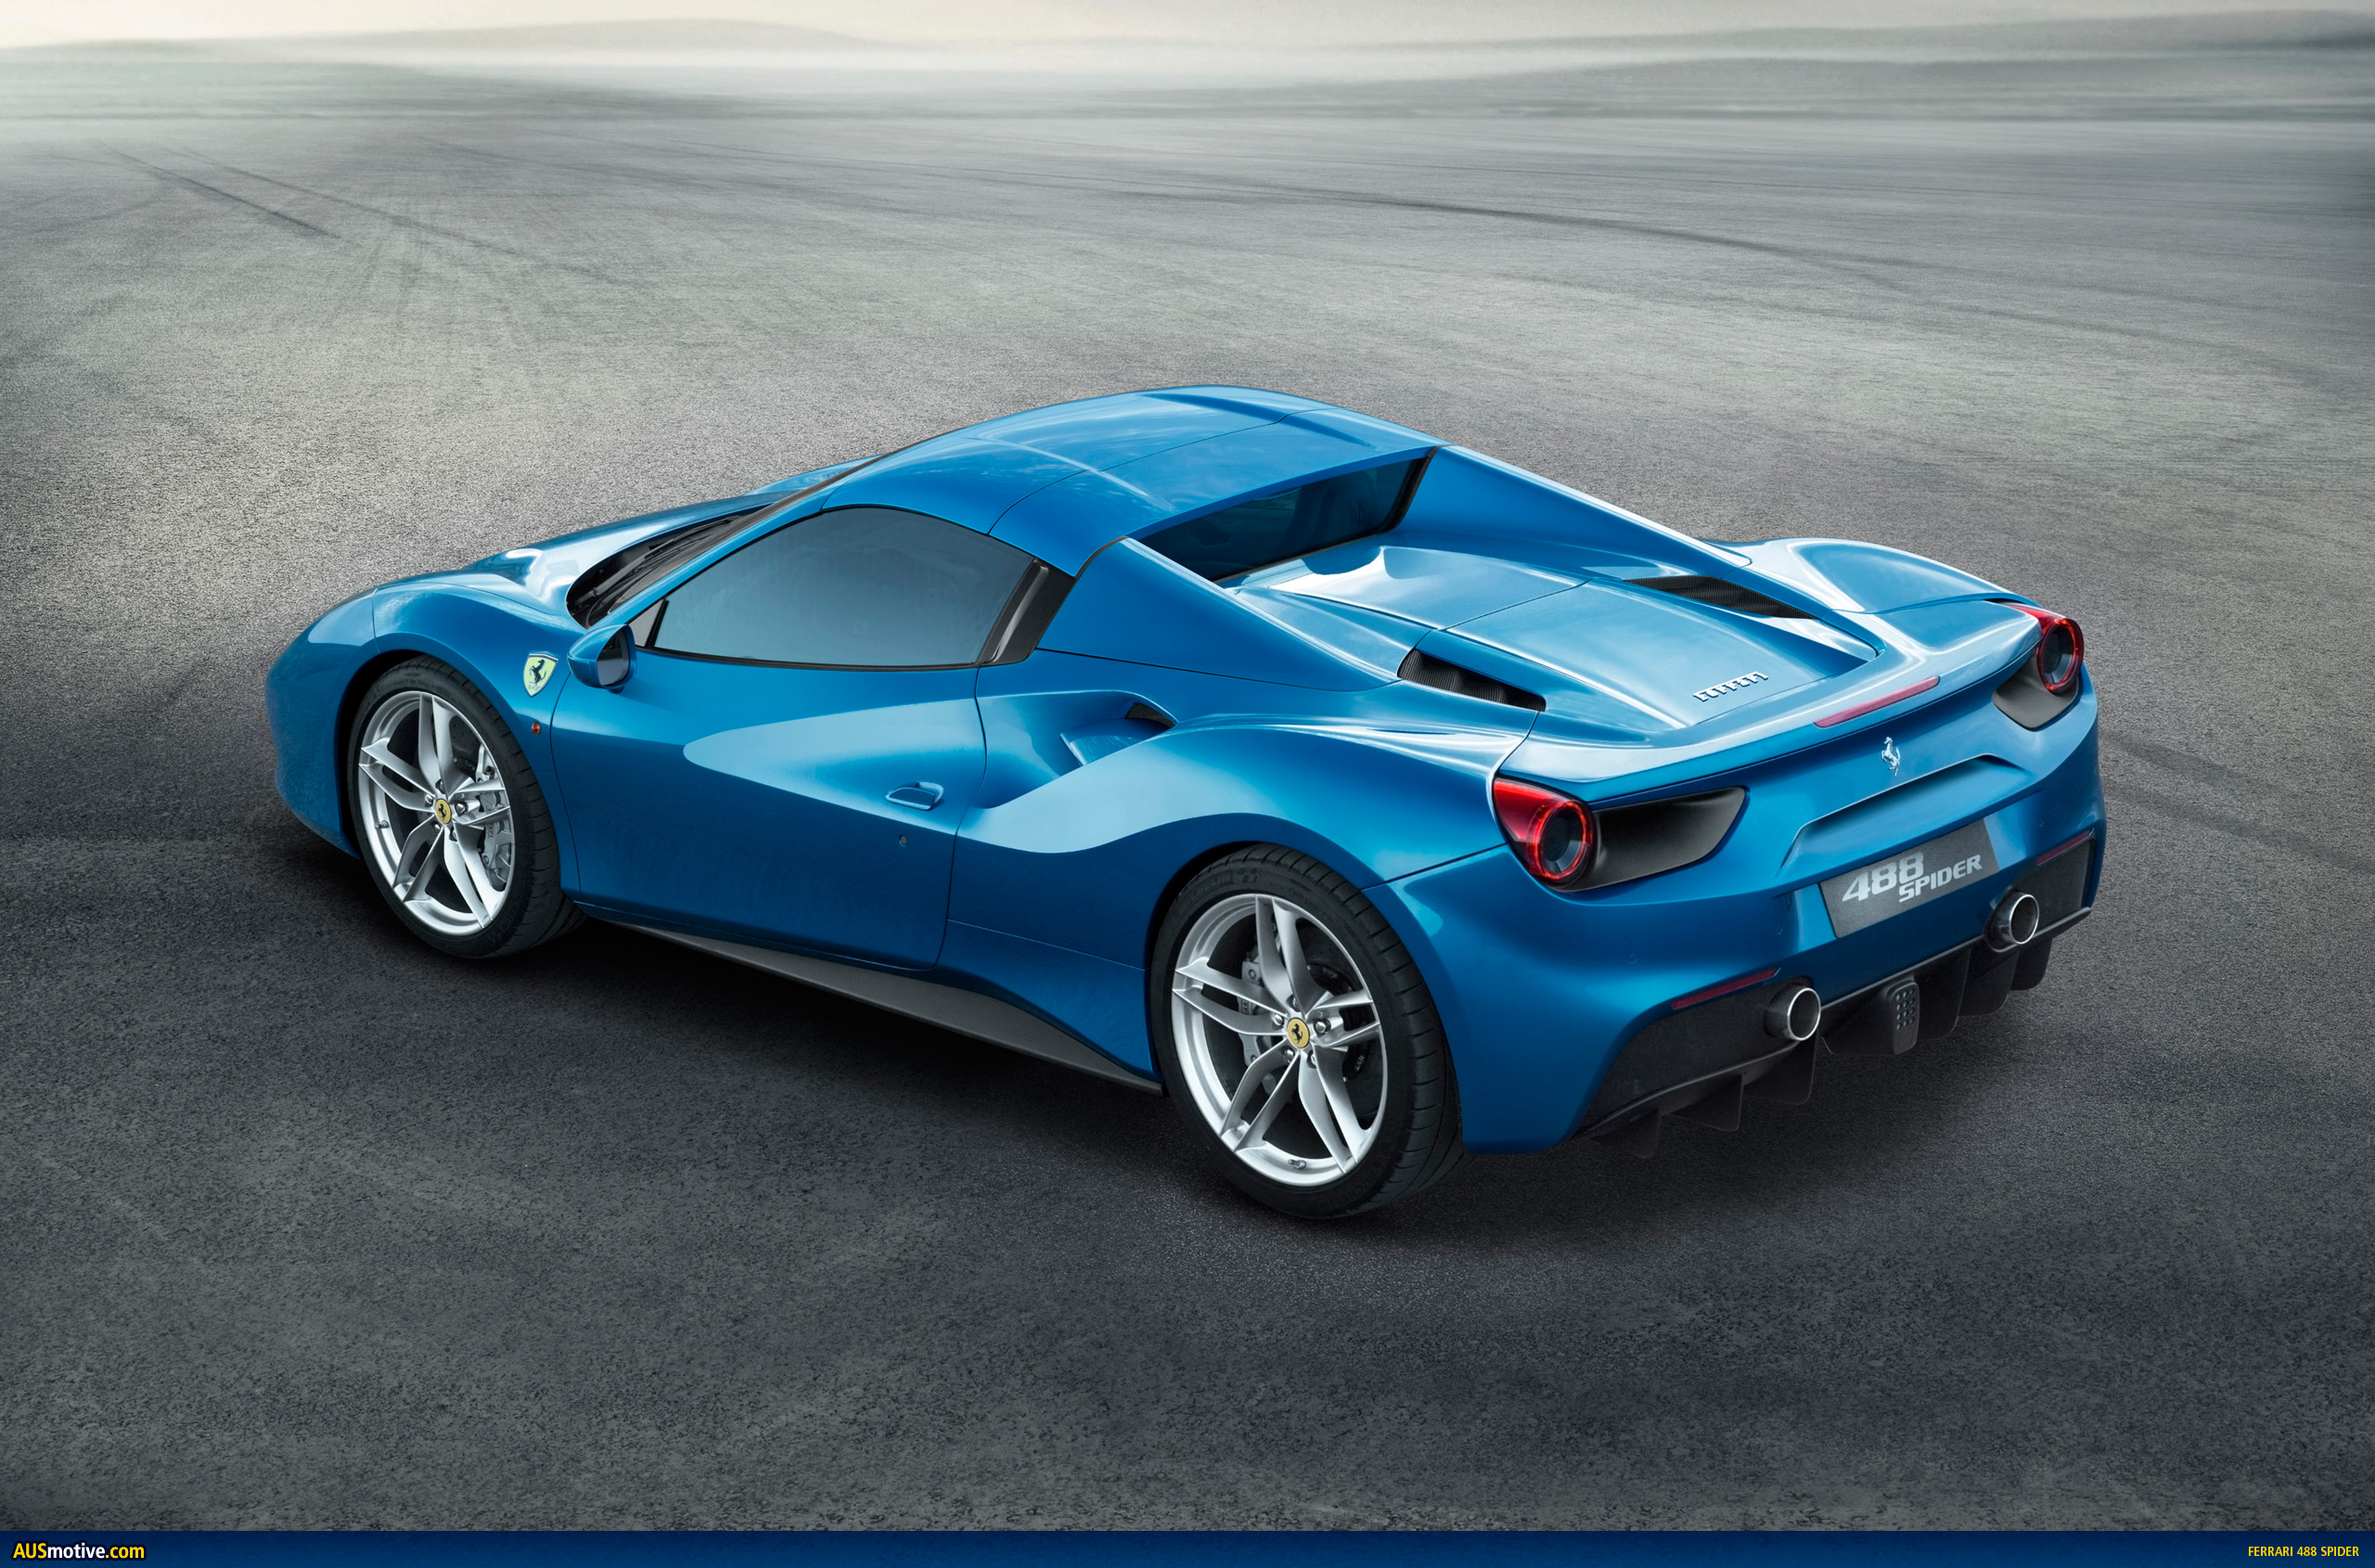 AUSmotive.com » Ferrari 488 Spider Revealed